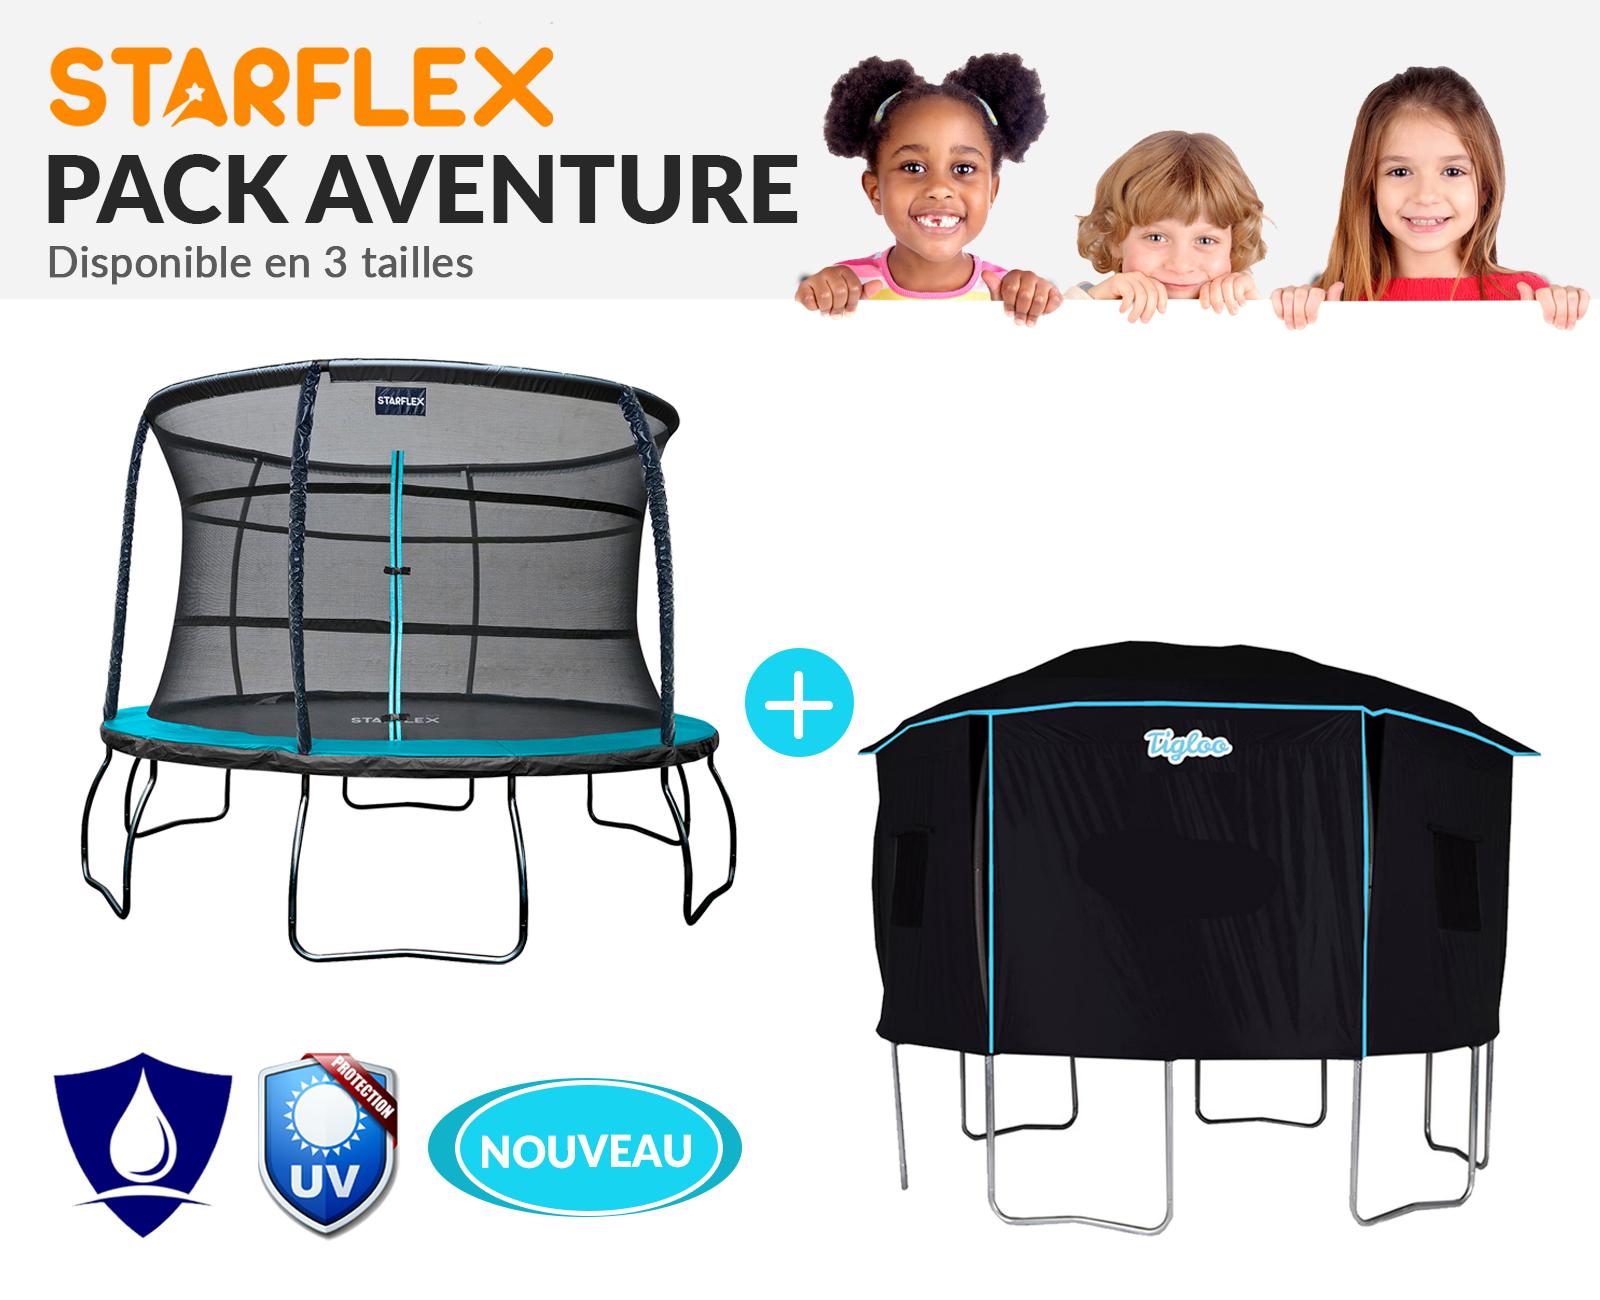 Starflex Pack Aventure